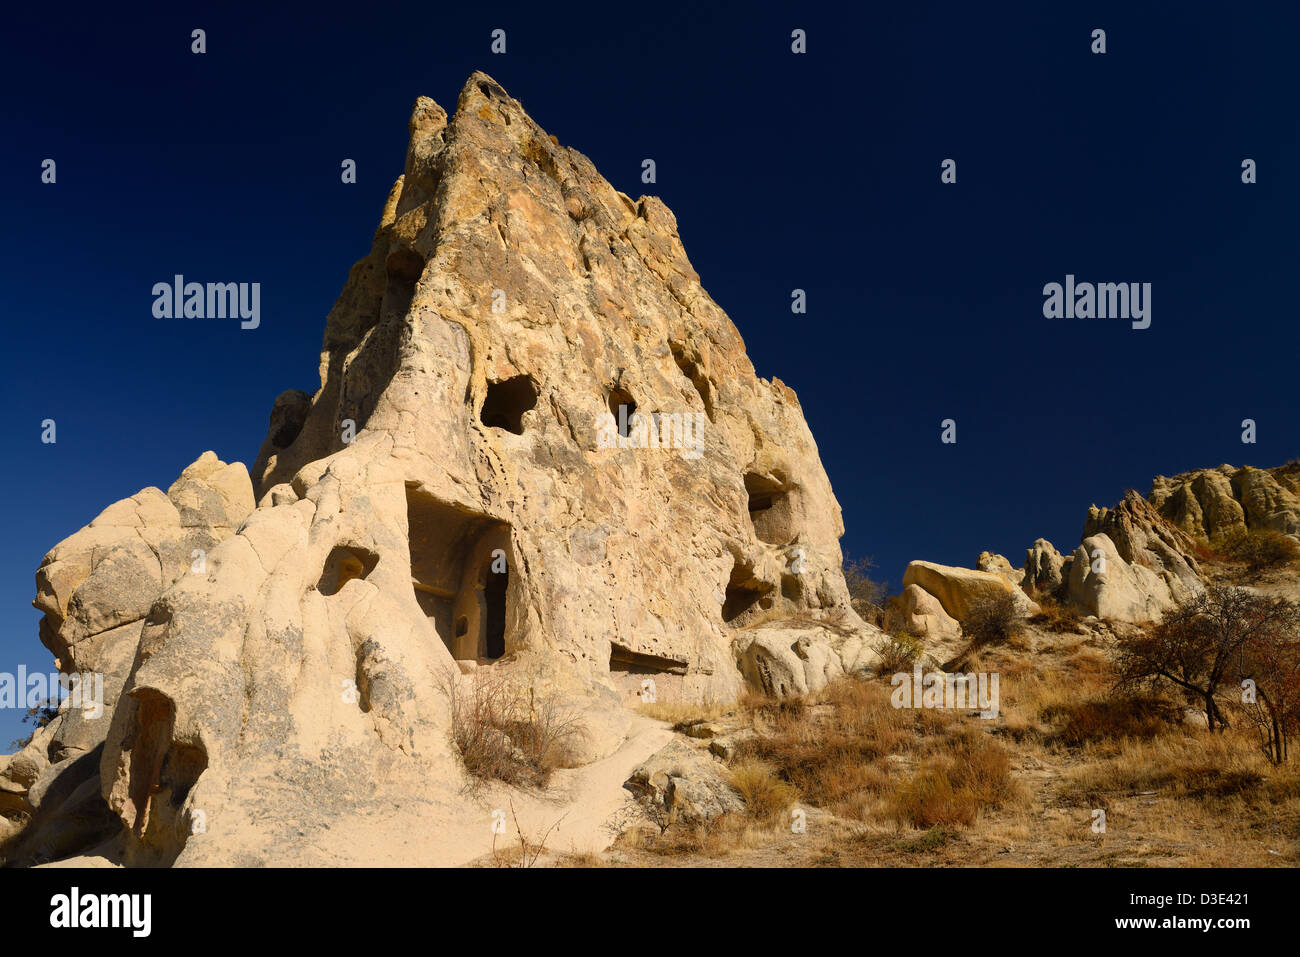 Kizlar Manastiri Nunnery Convent Monastery at Goreme Open Air Museum Cappadocia Turkey with dark blue sky - Stock Image